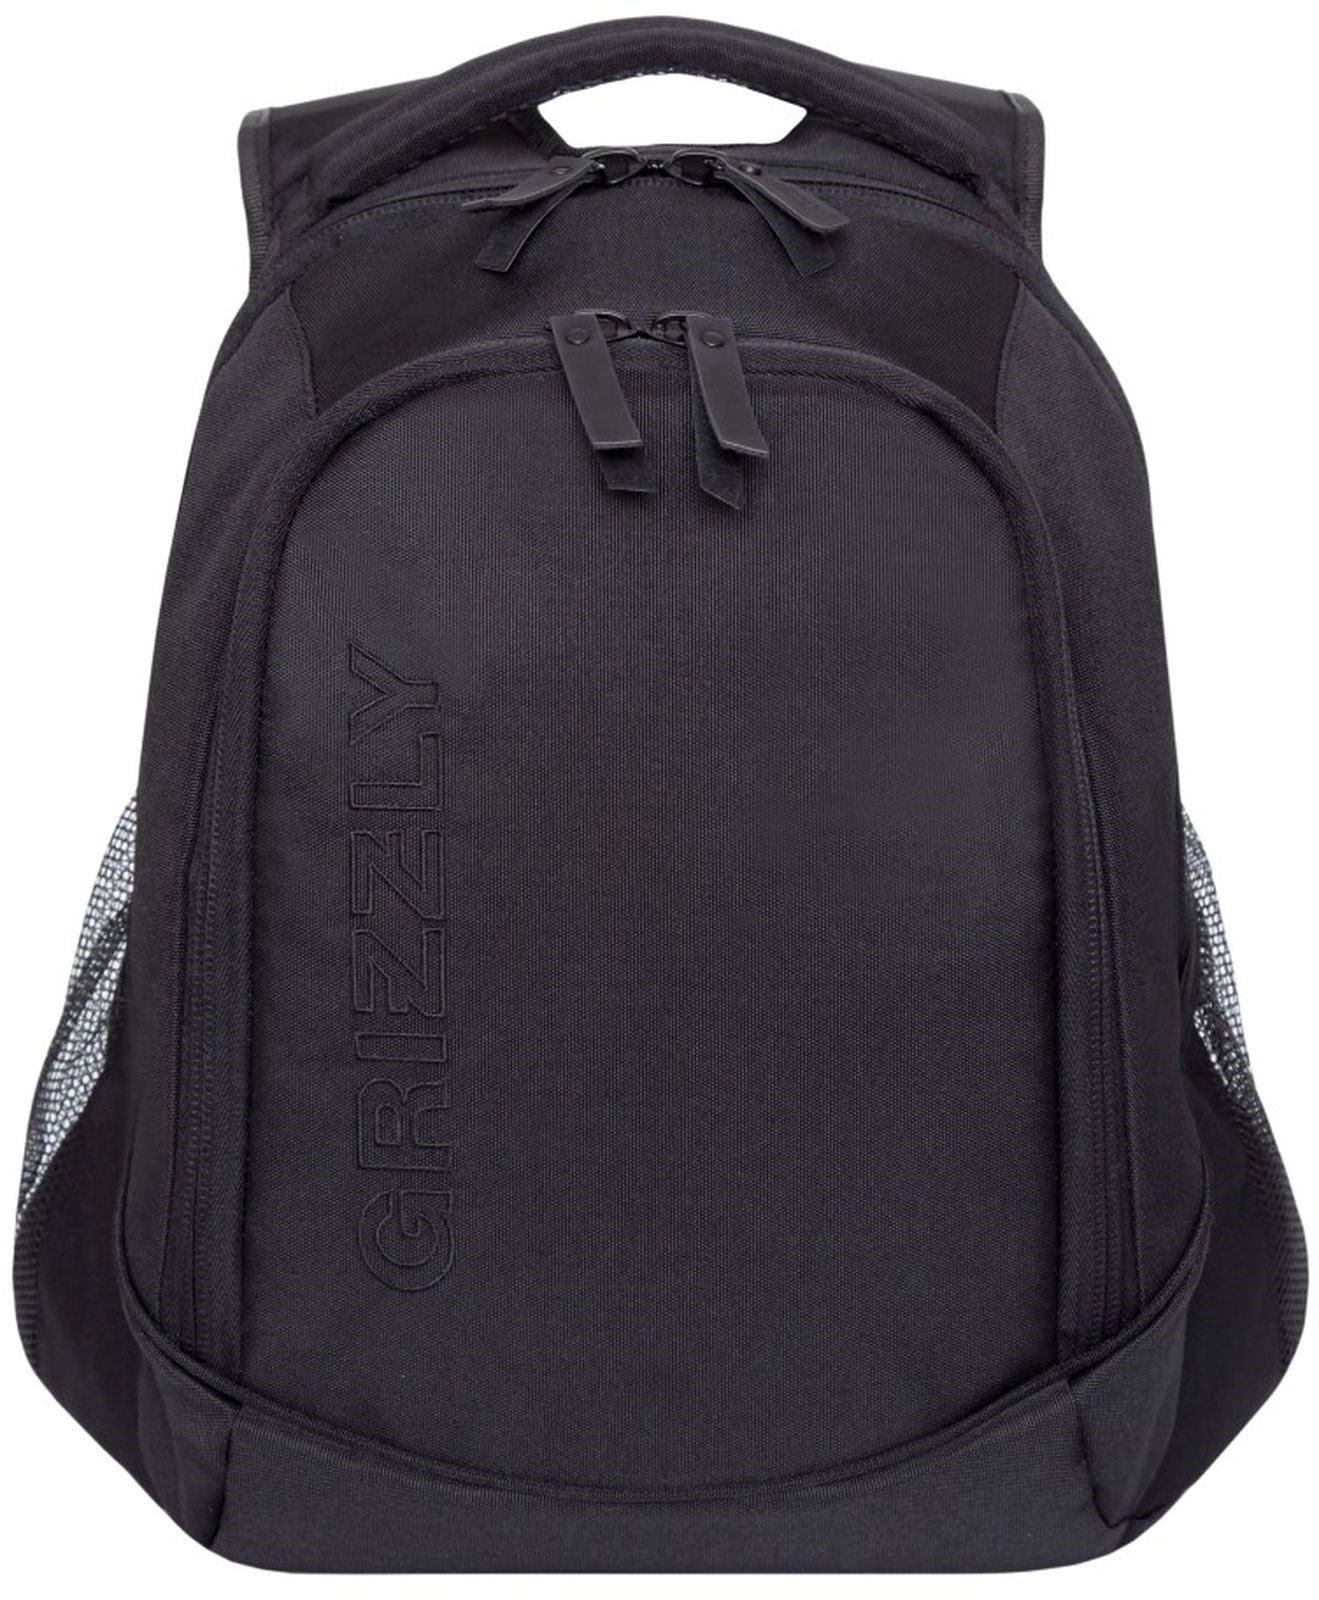 Рюкзак Grizzly, RU-928-2/3, черный рюкзак grizzly ru 804 3 2 black lime green